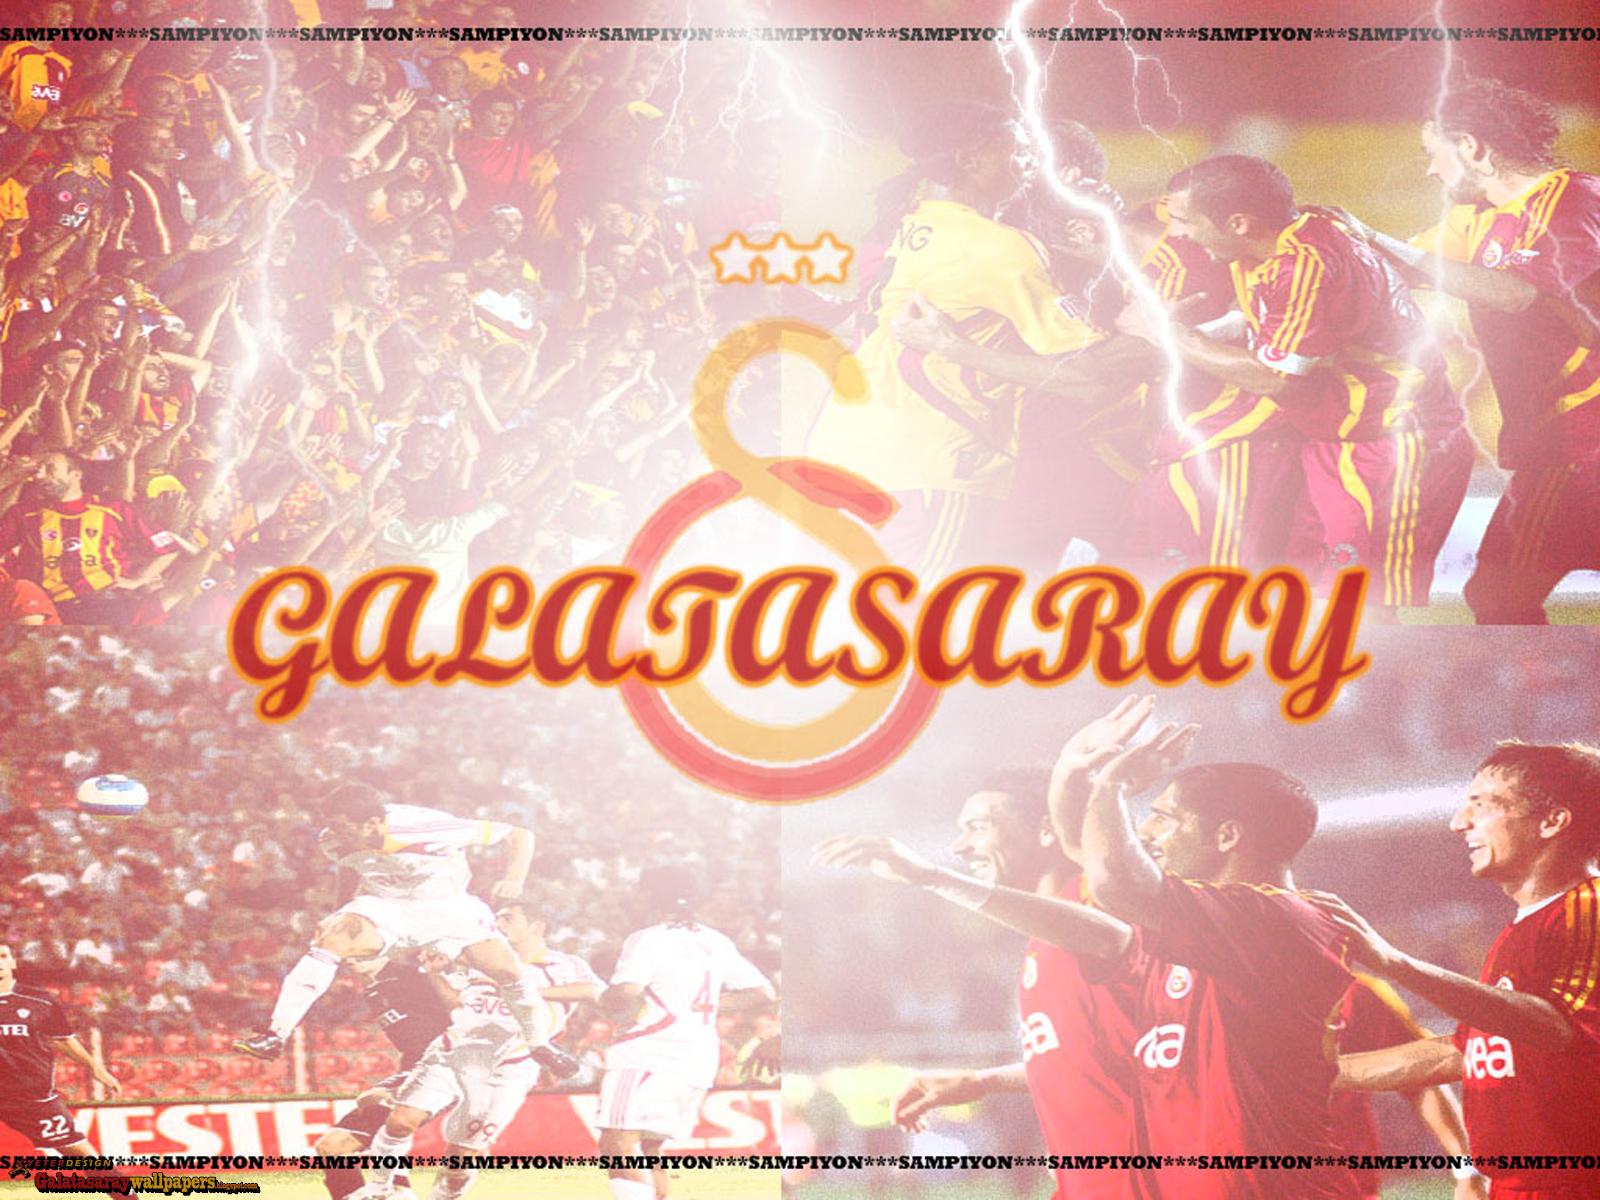 http://3.bp.blogspot.com/_1_qHrQBPgHE/TMTzTg1ypEI/AAAAAAAABIc/Q9eu6xrglhA/s1600/Galatasaray+2007-2008+-+Sampiyon+GW+2.jpg